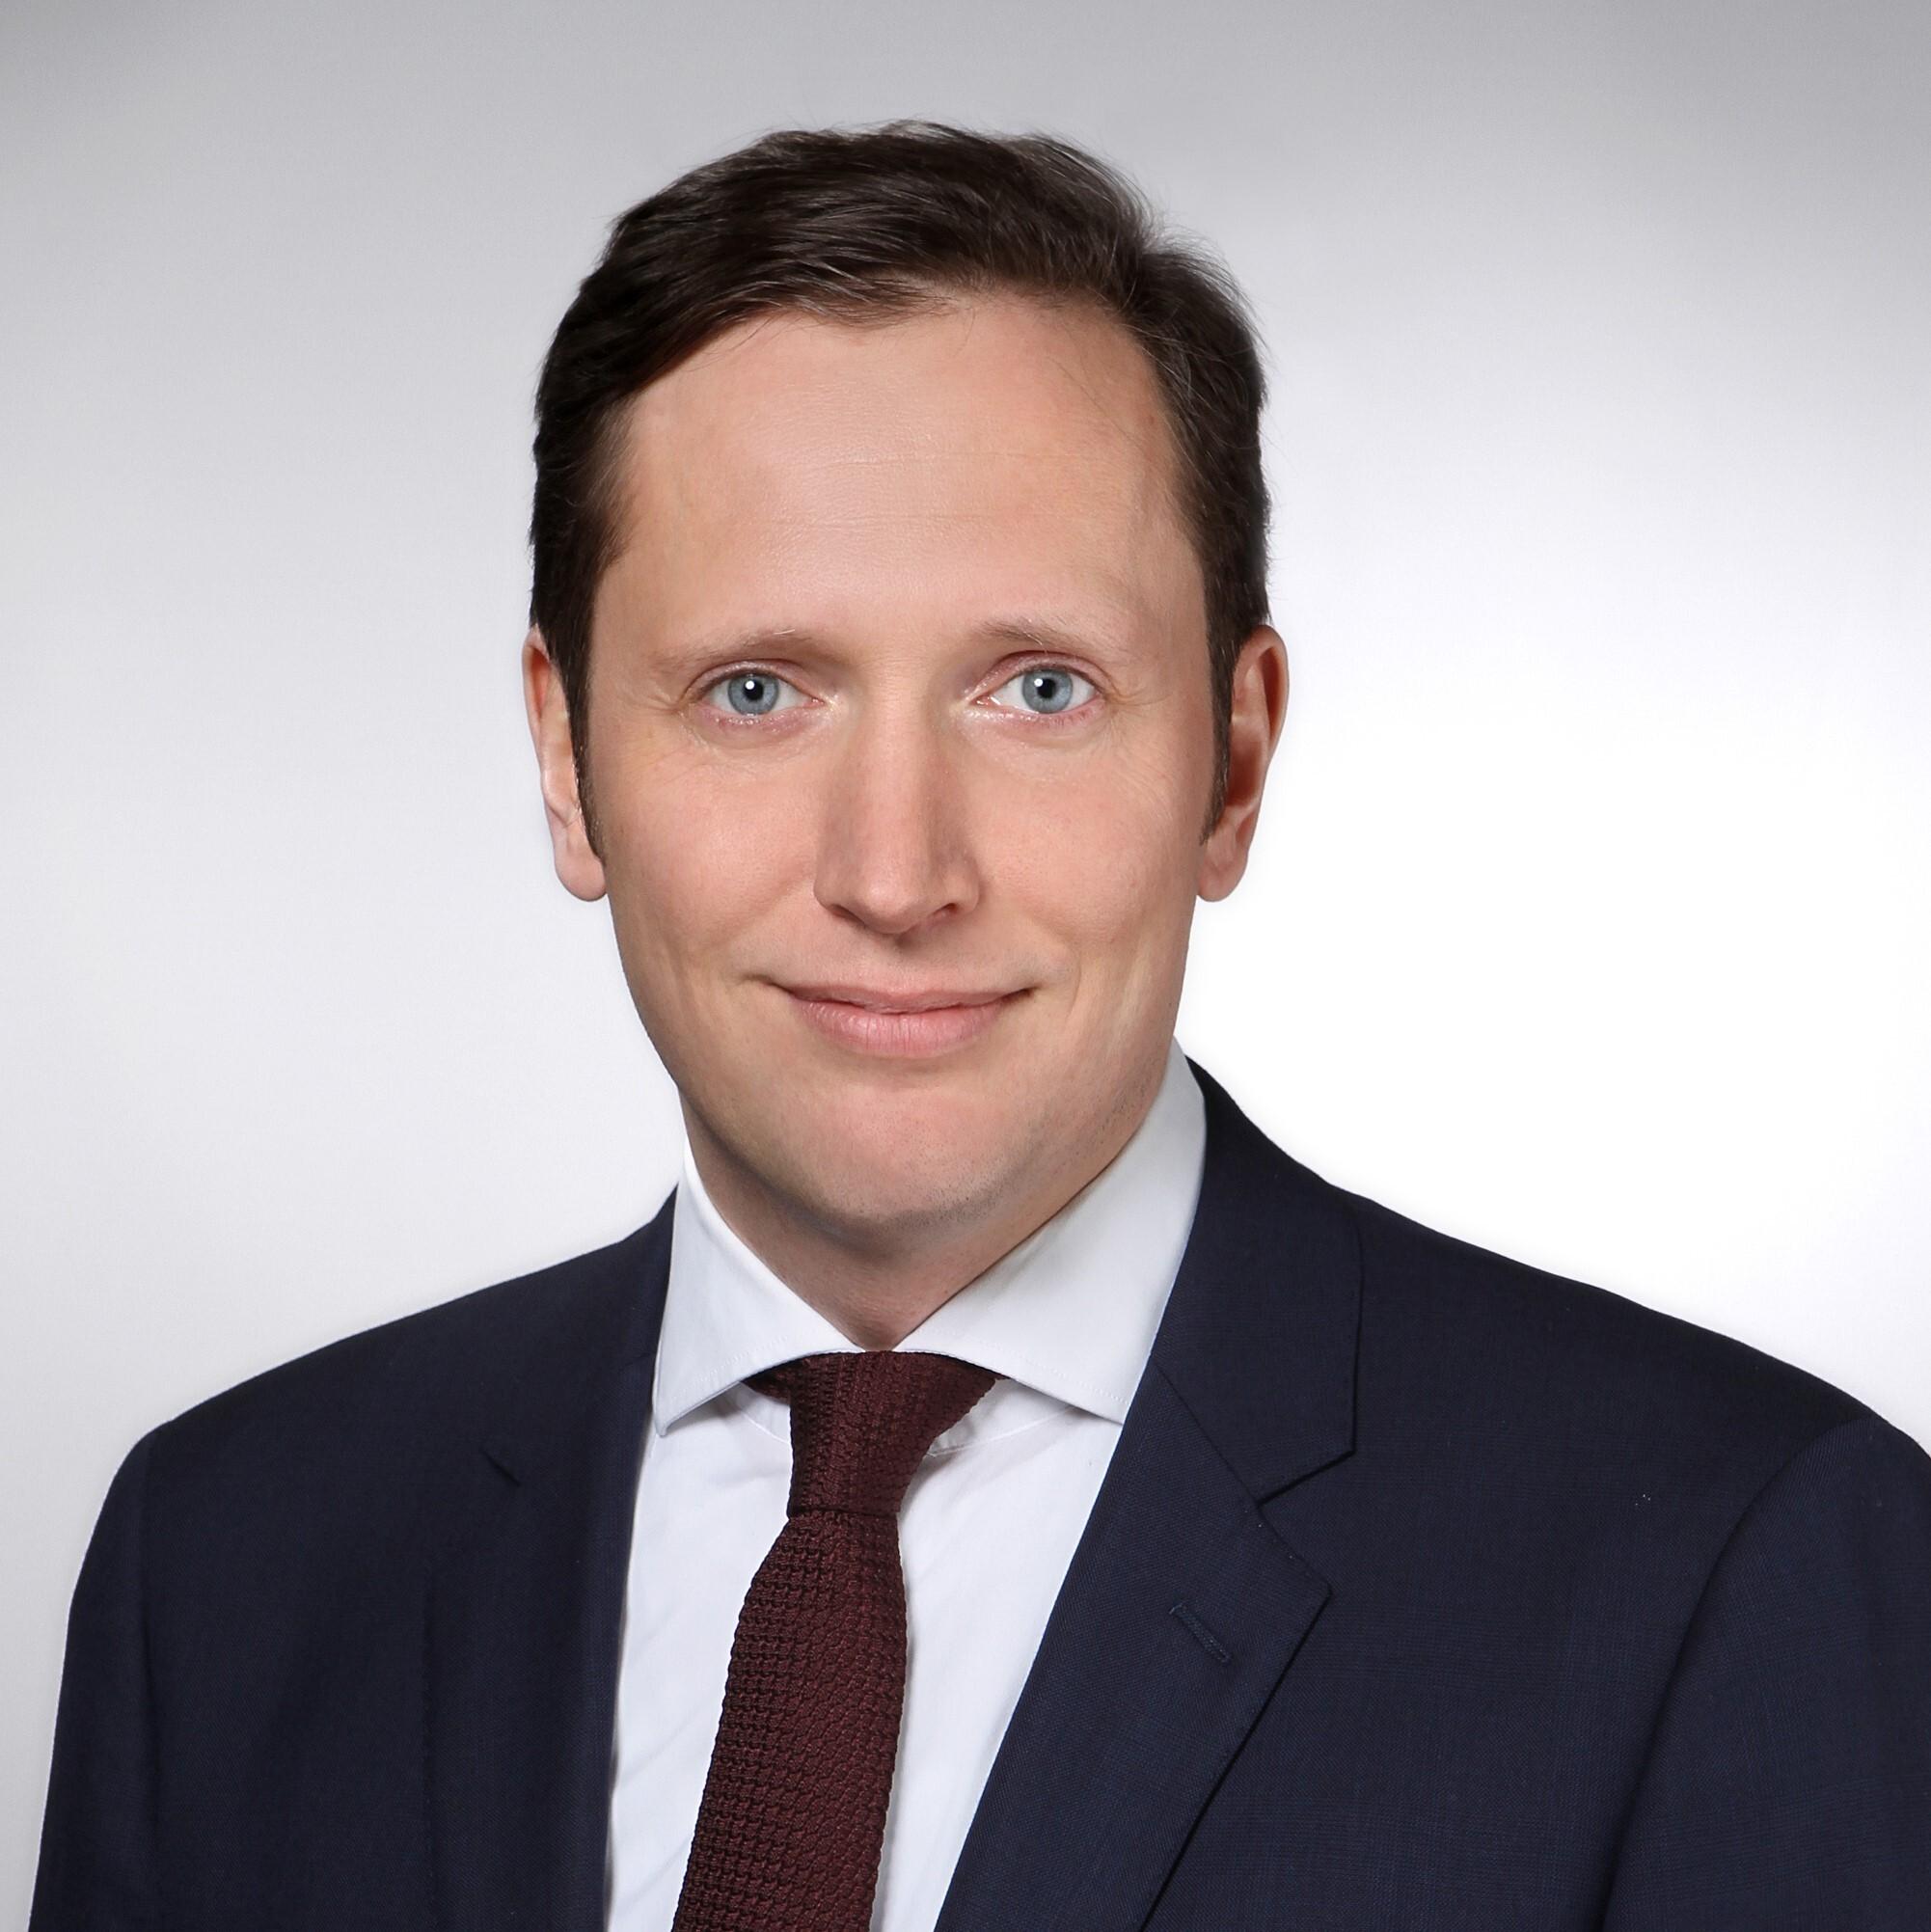 Andreas Polter